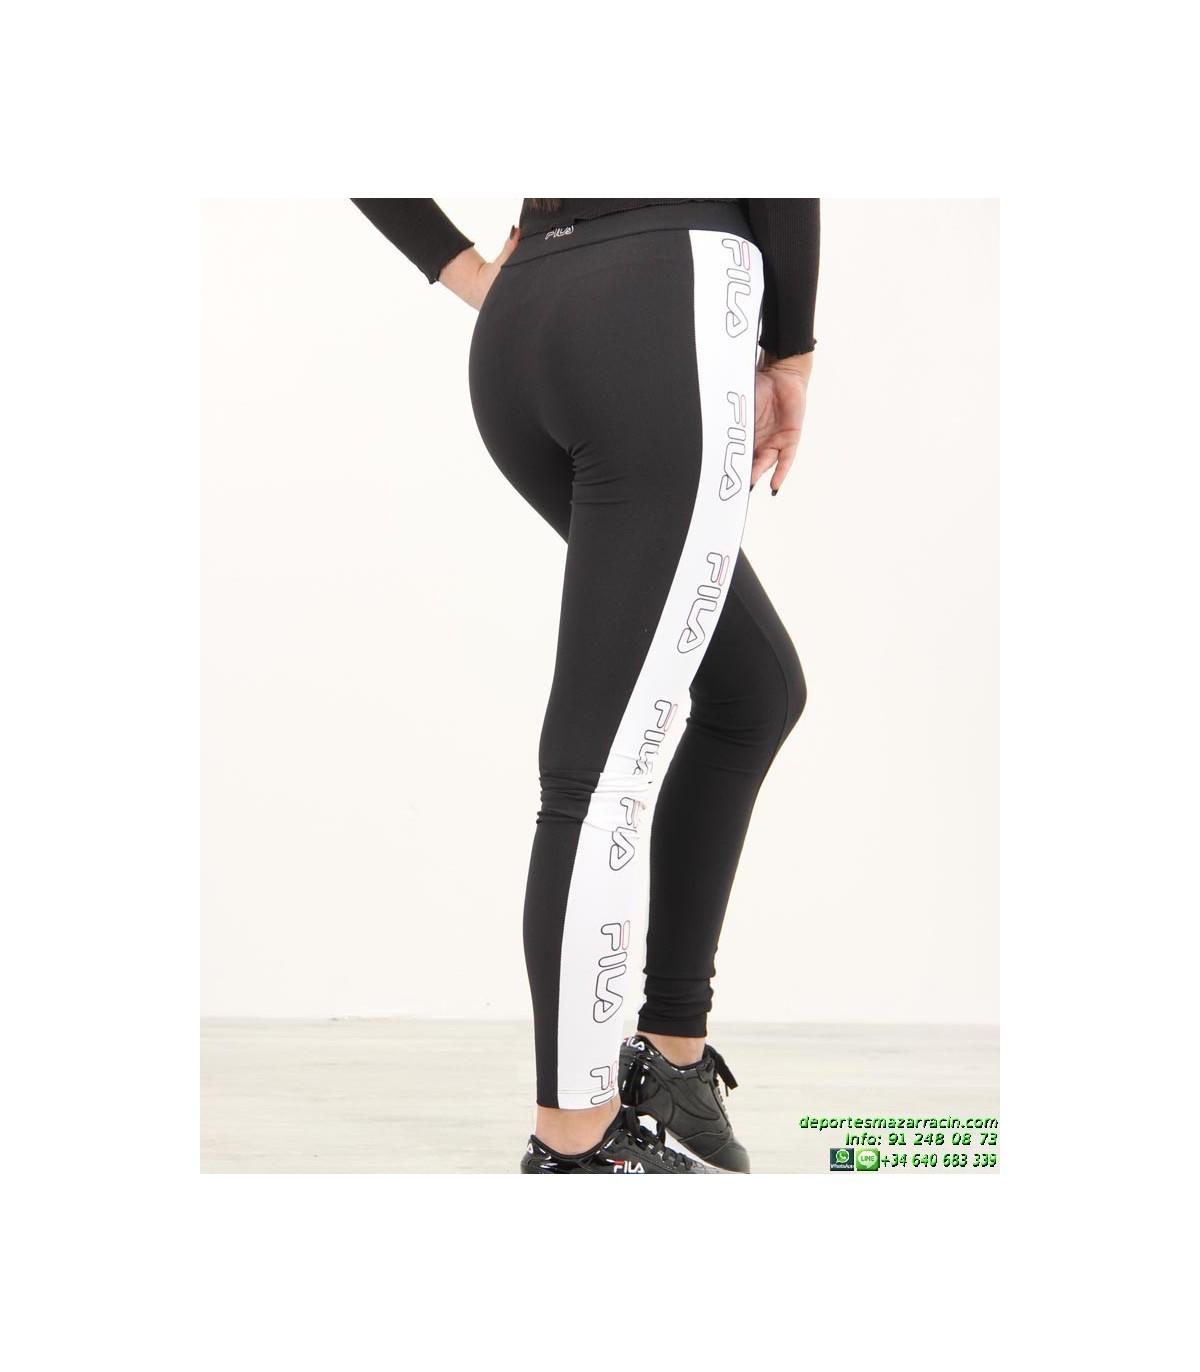 d53df1bc4 Malla Larga FILA Legging A Bandas Negro-Blanco 682038 mujer